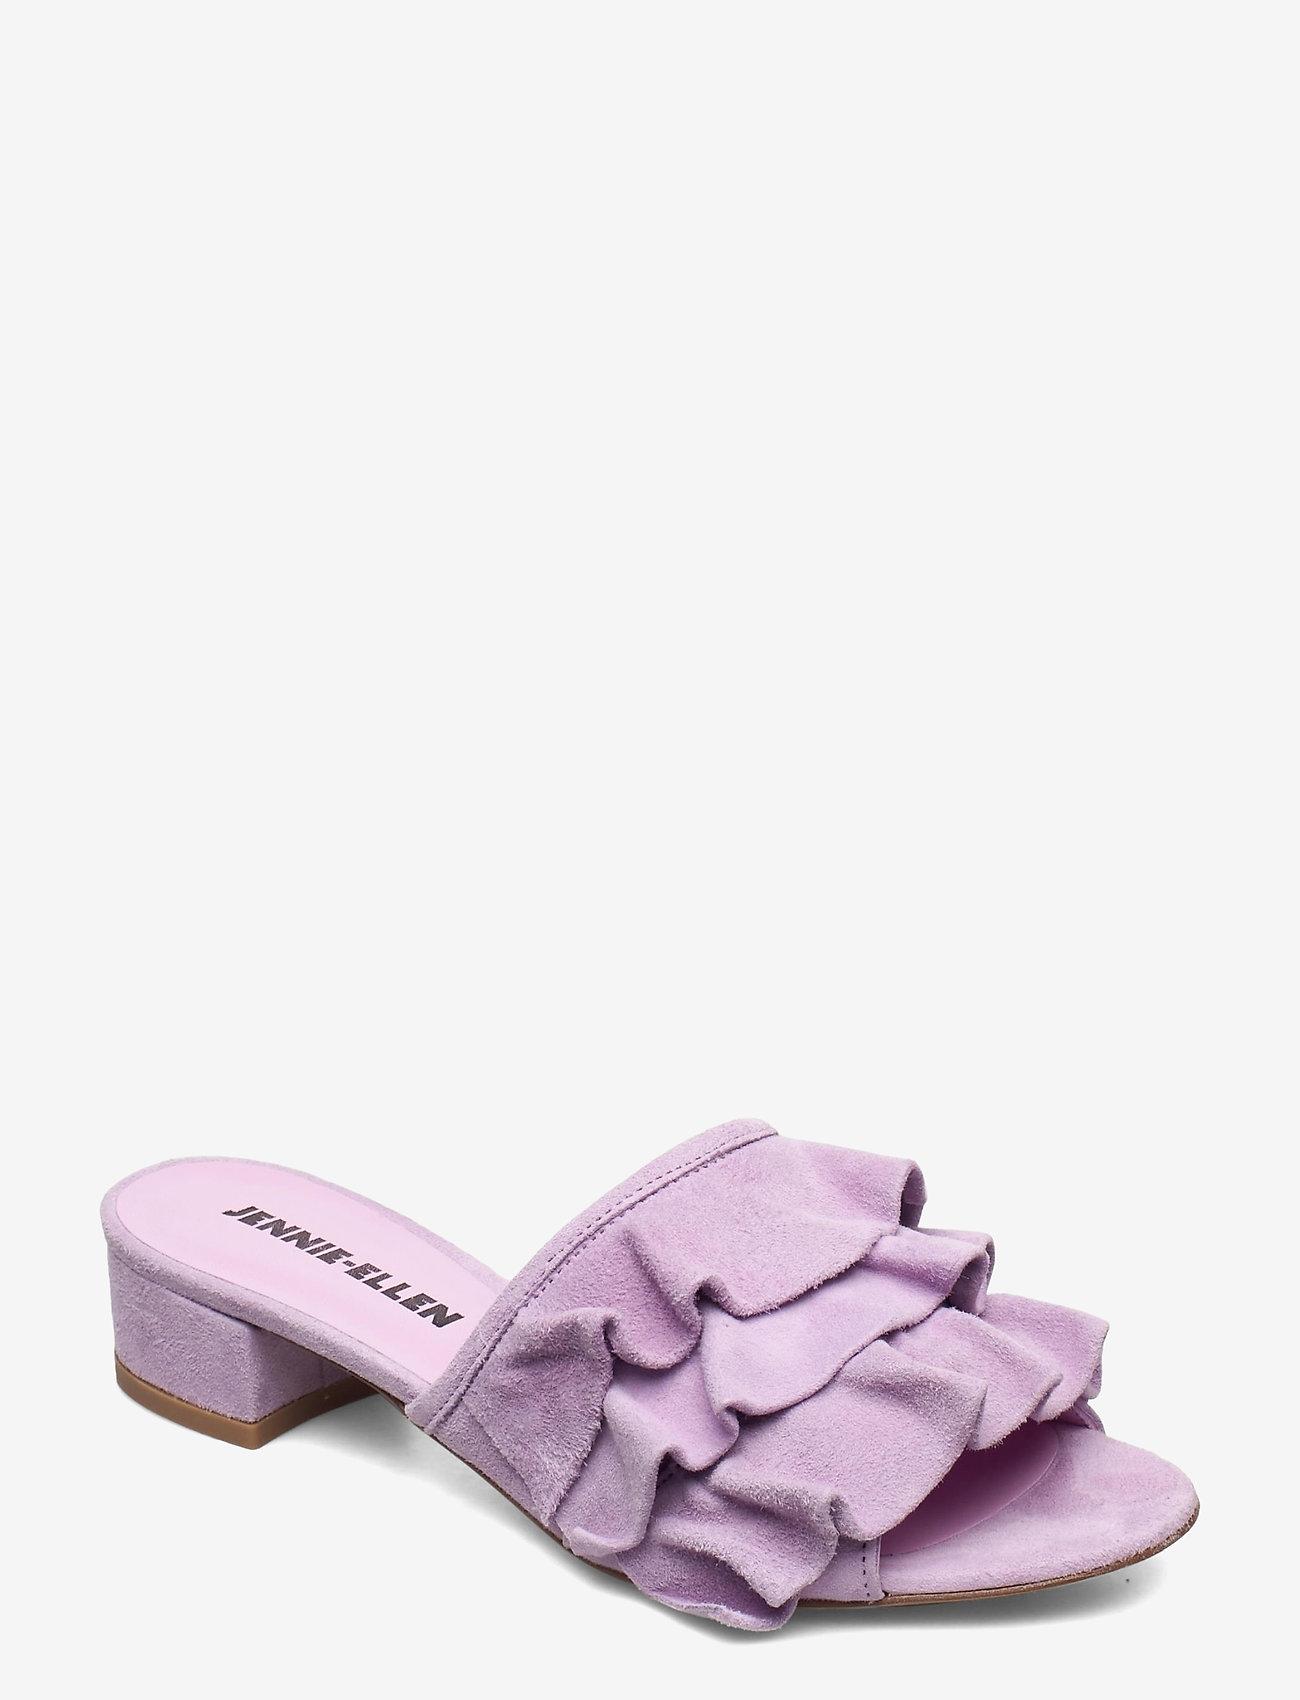 Jennie-Ellen - Maxi - mules & slipins - purple suede leather - 1